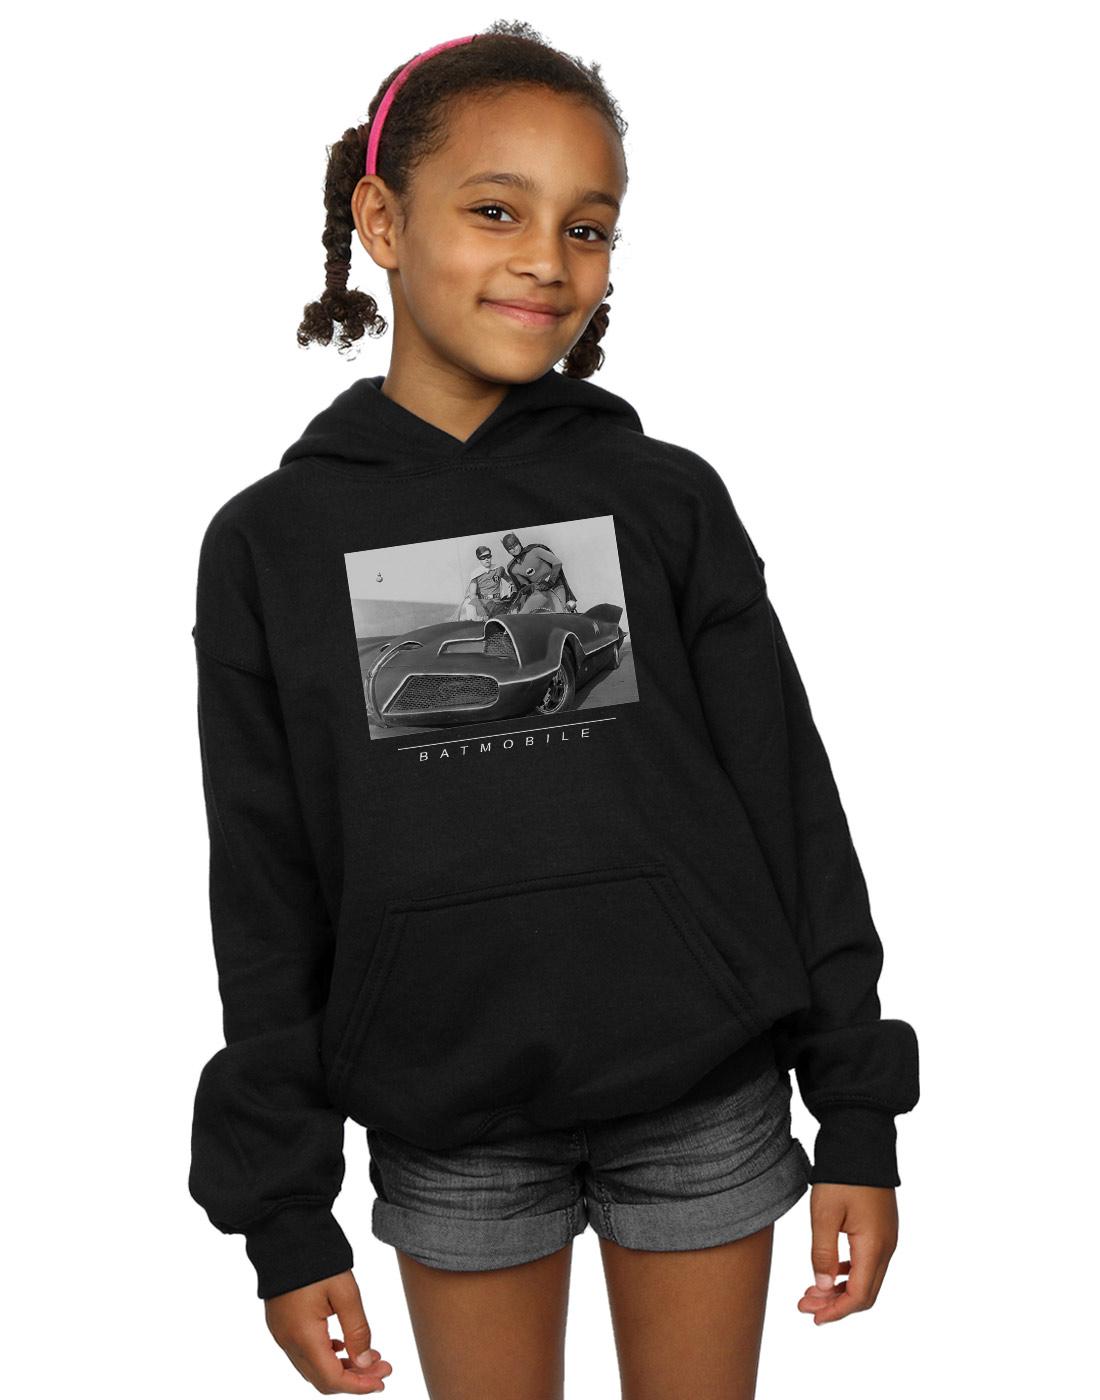 DC Comics Girls Batman TV Series Batmobile Sweatshirt